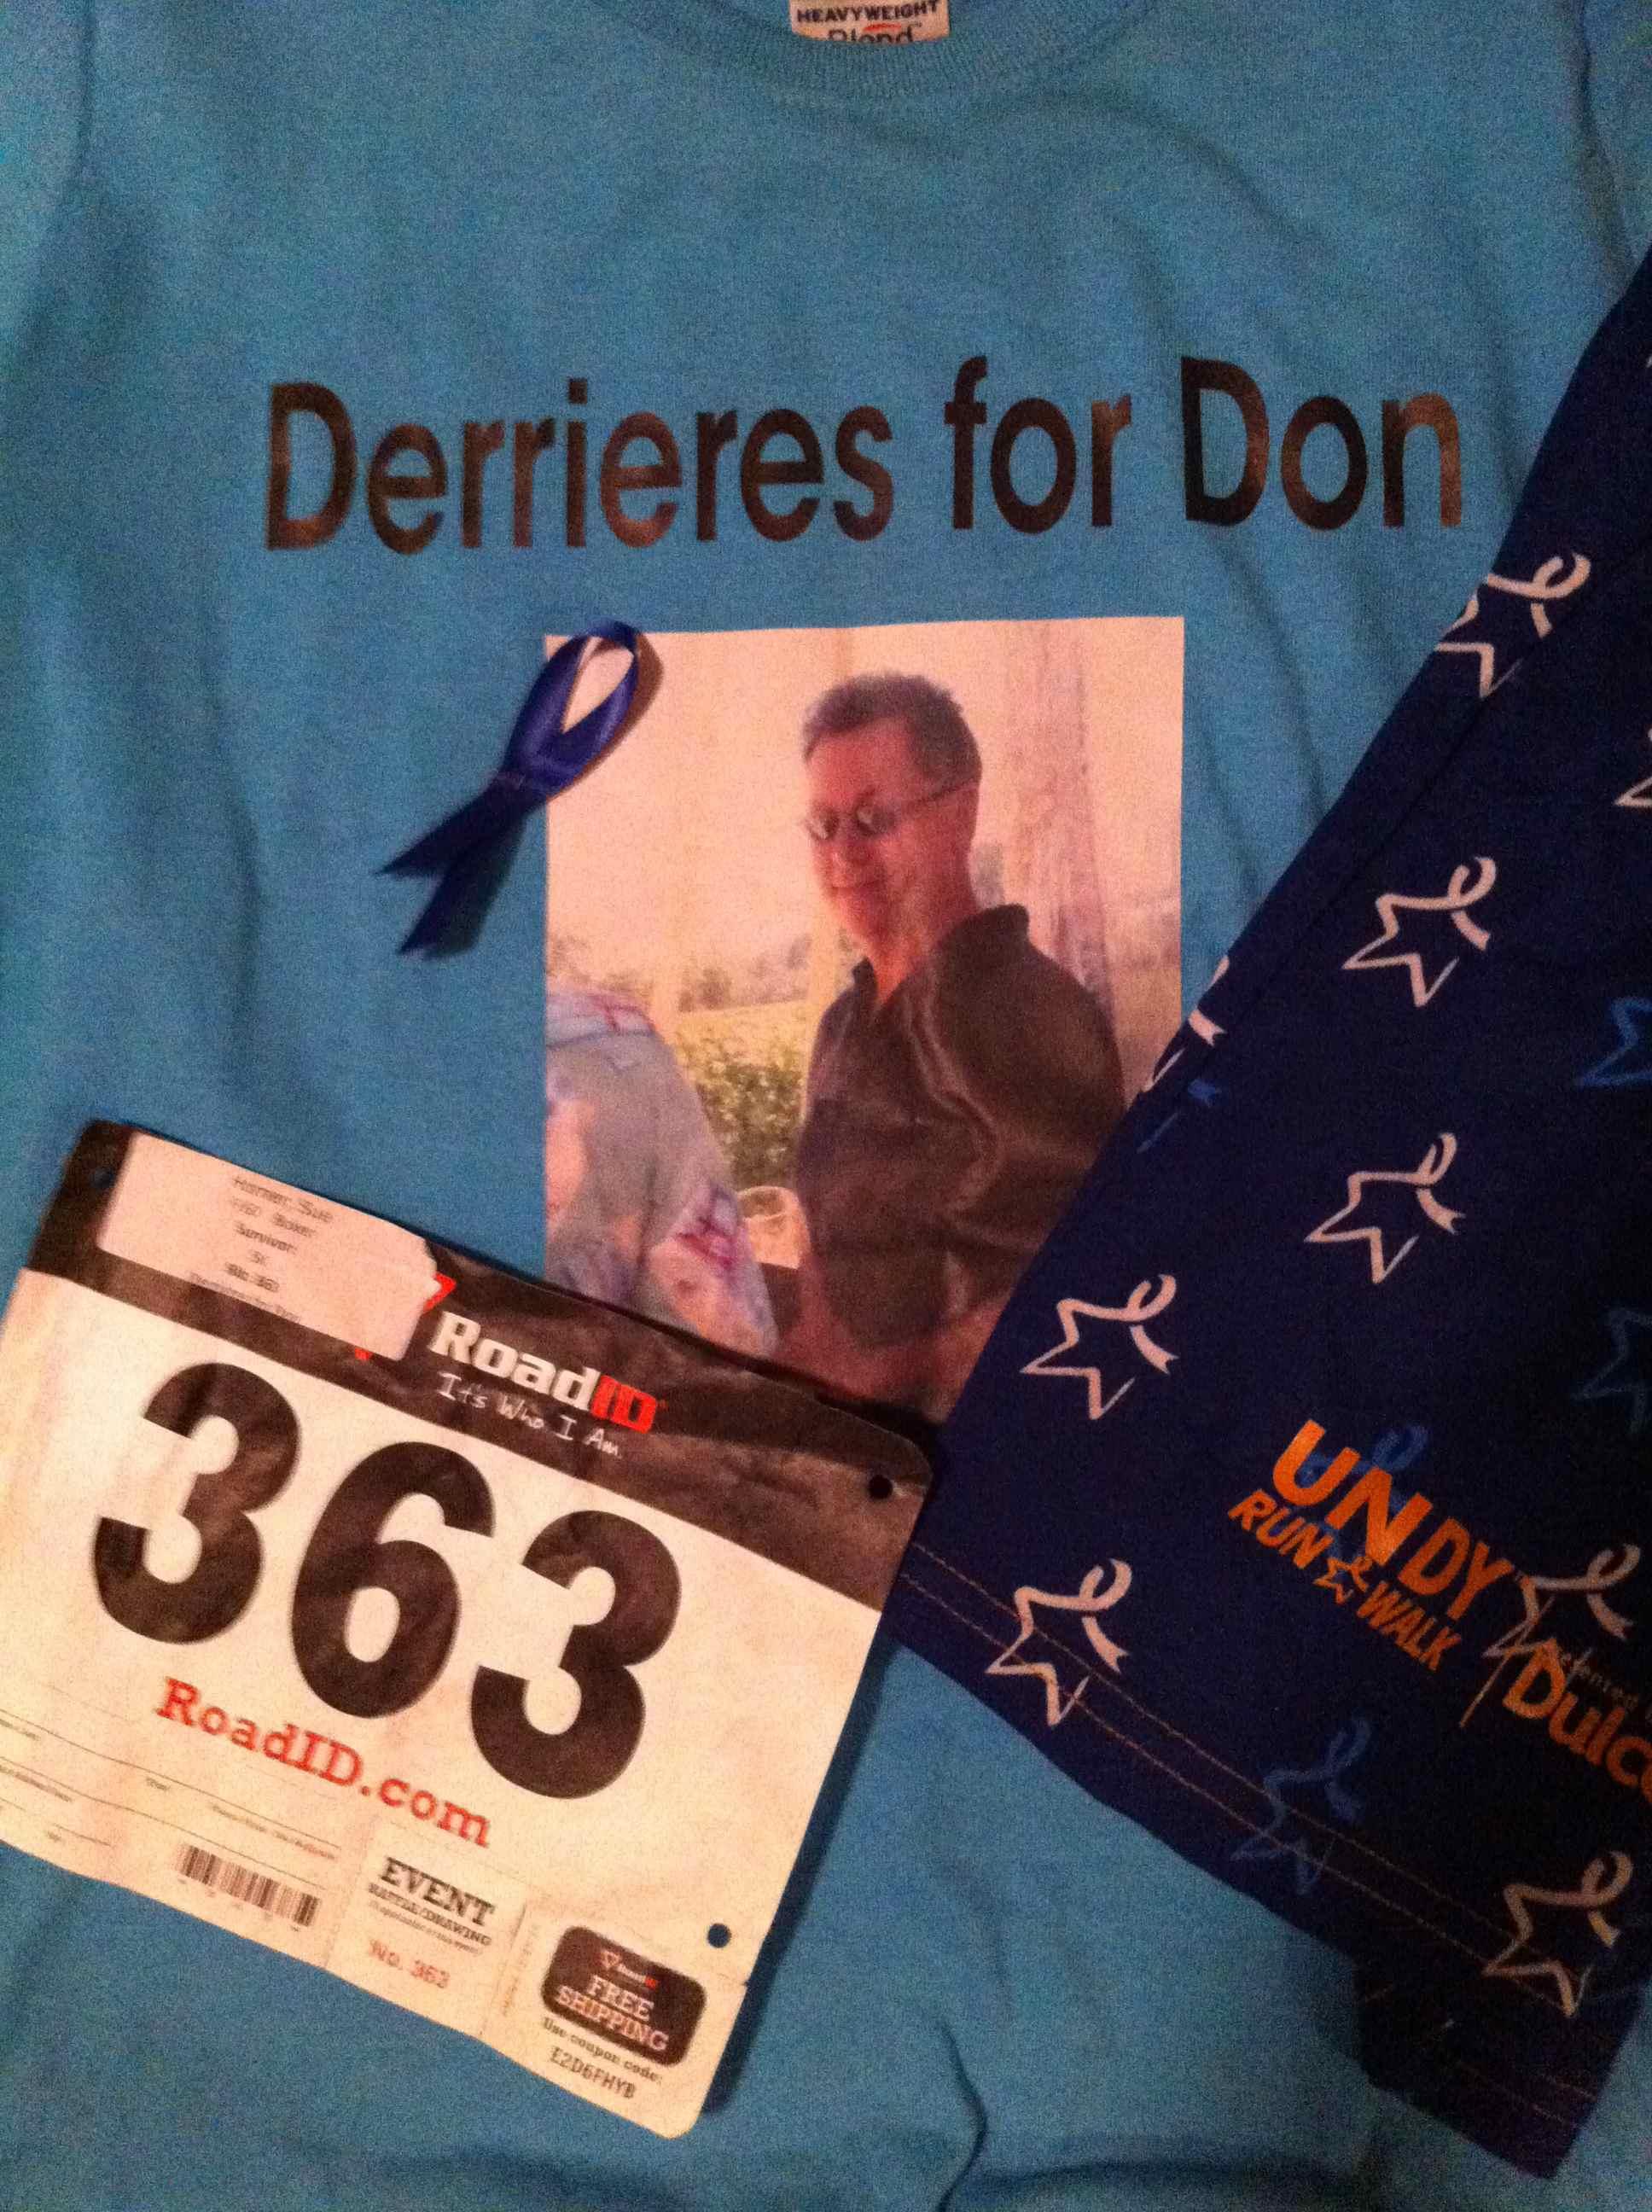 Undy Run for colon cancer